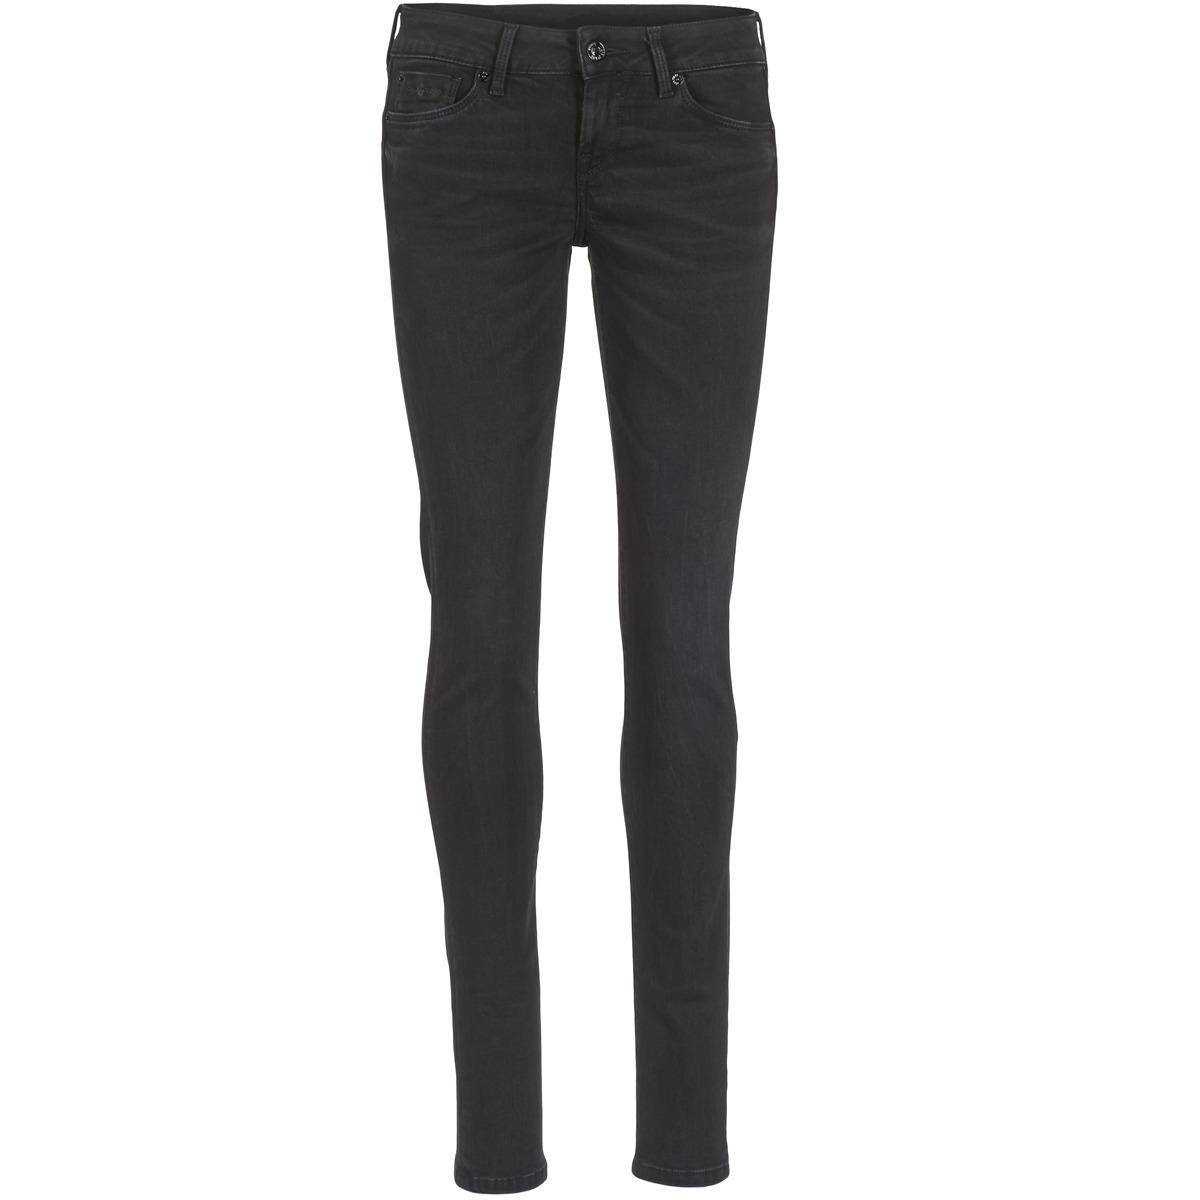 pepe jeans soho negro s98 env o gratis con. Black Bedroom Furniture Sets. Home Design Ideas